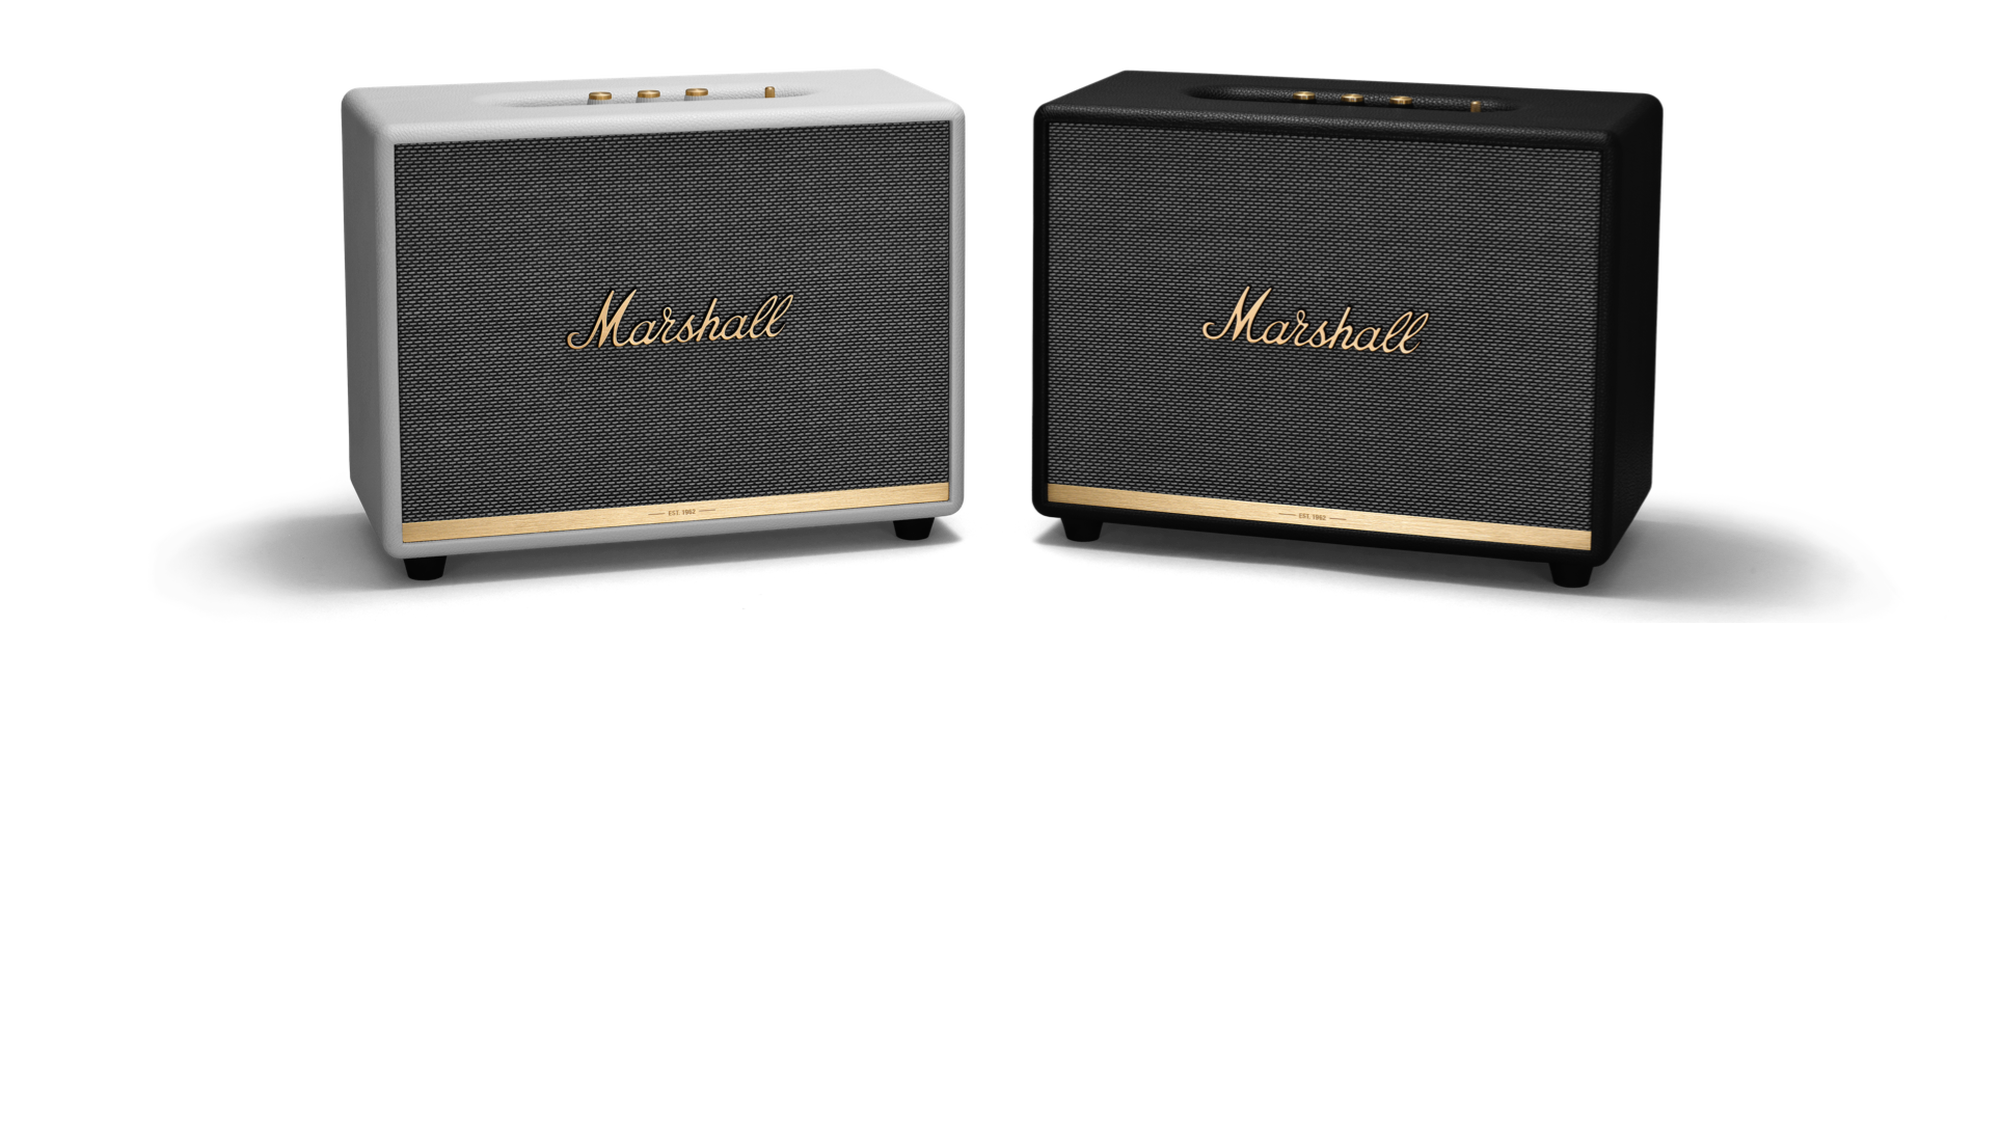 marshall-woburn-ii-usp1-Desktop_4@1,41x.png